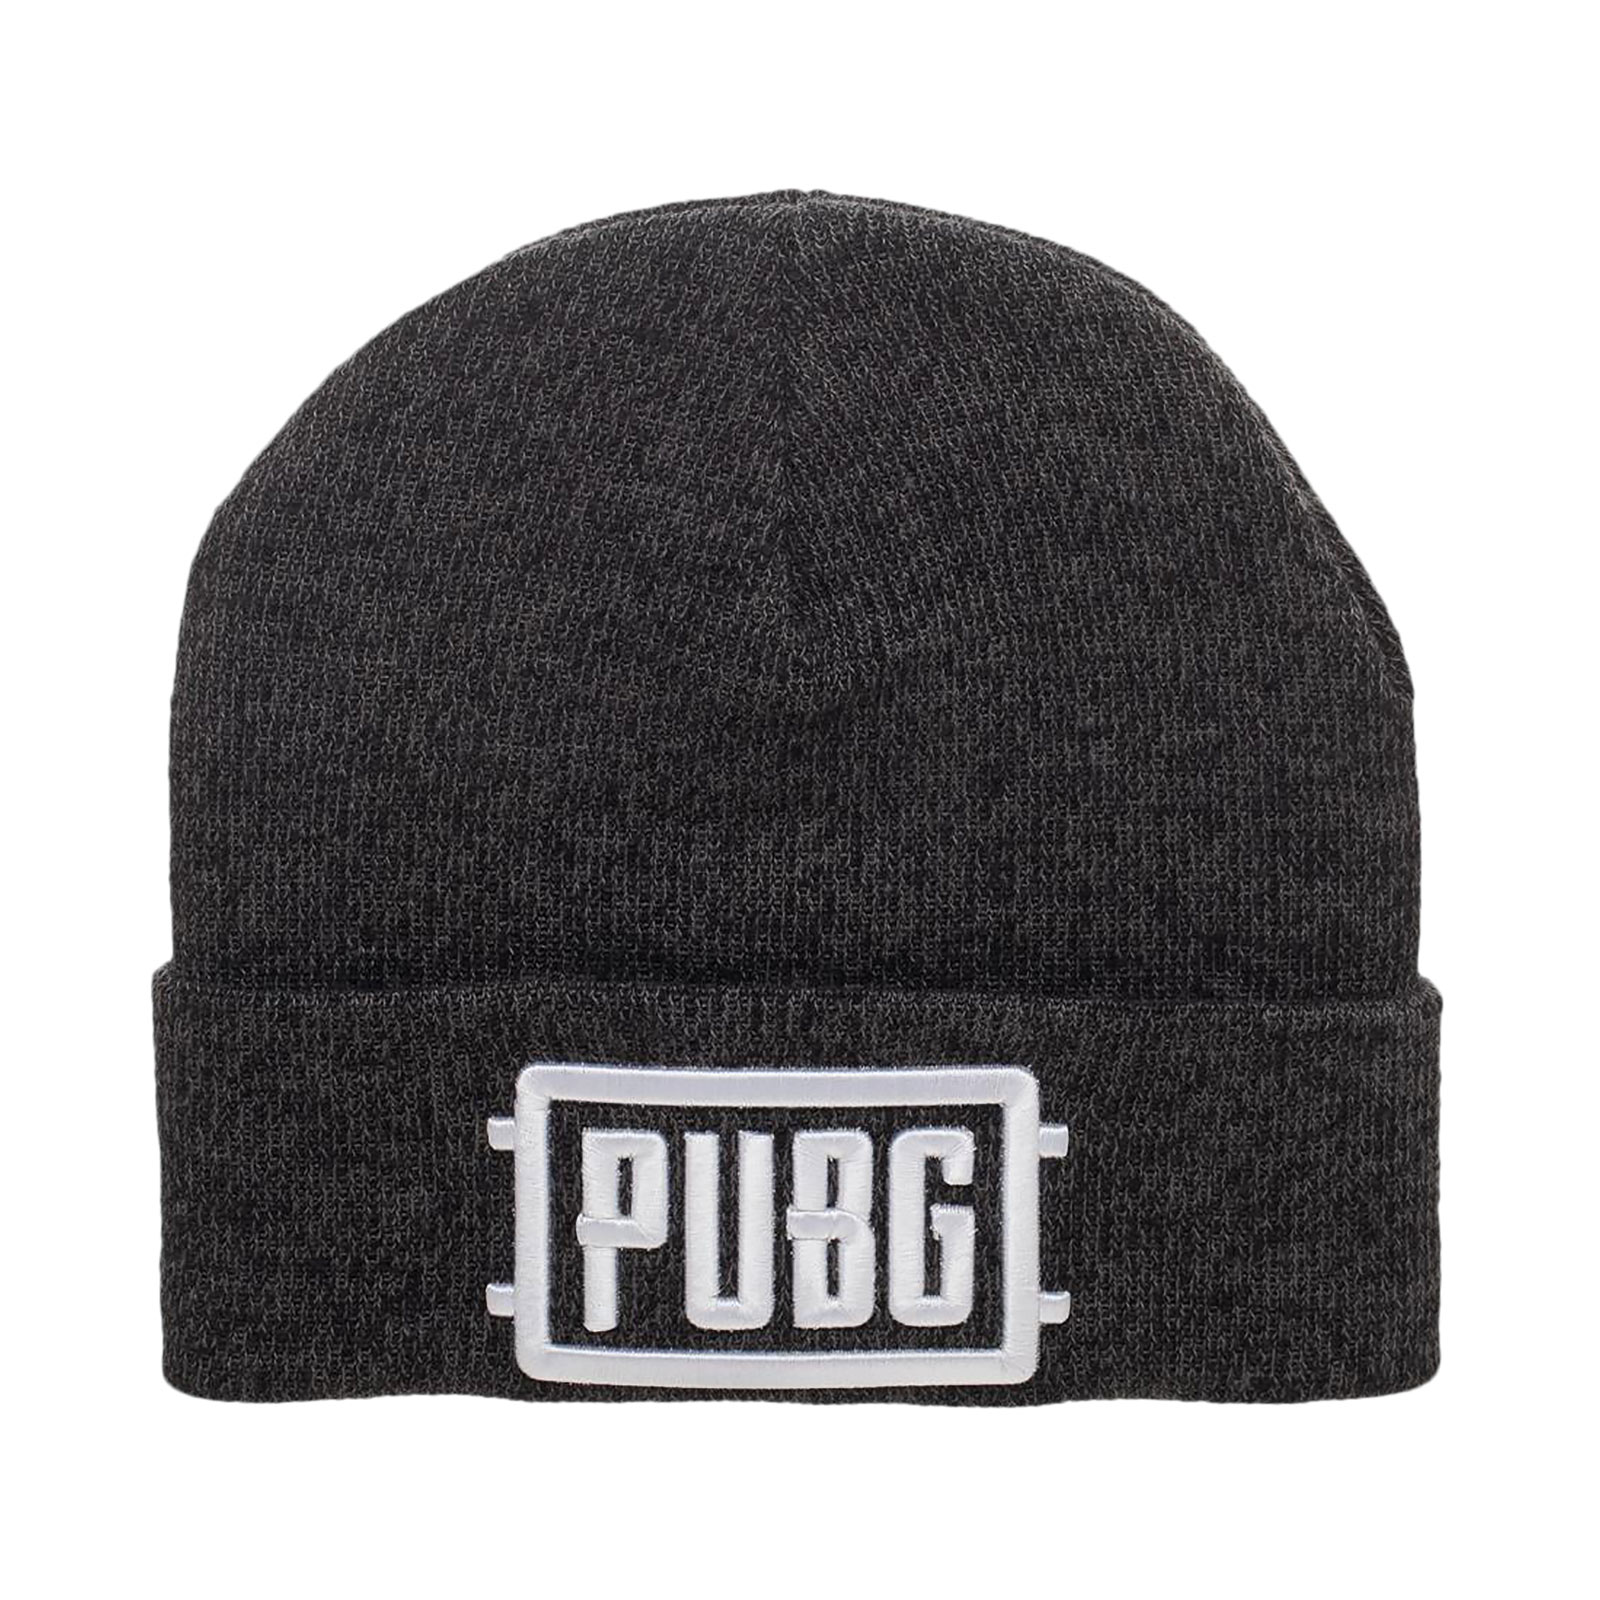 PUBG - Logo Mütze